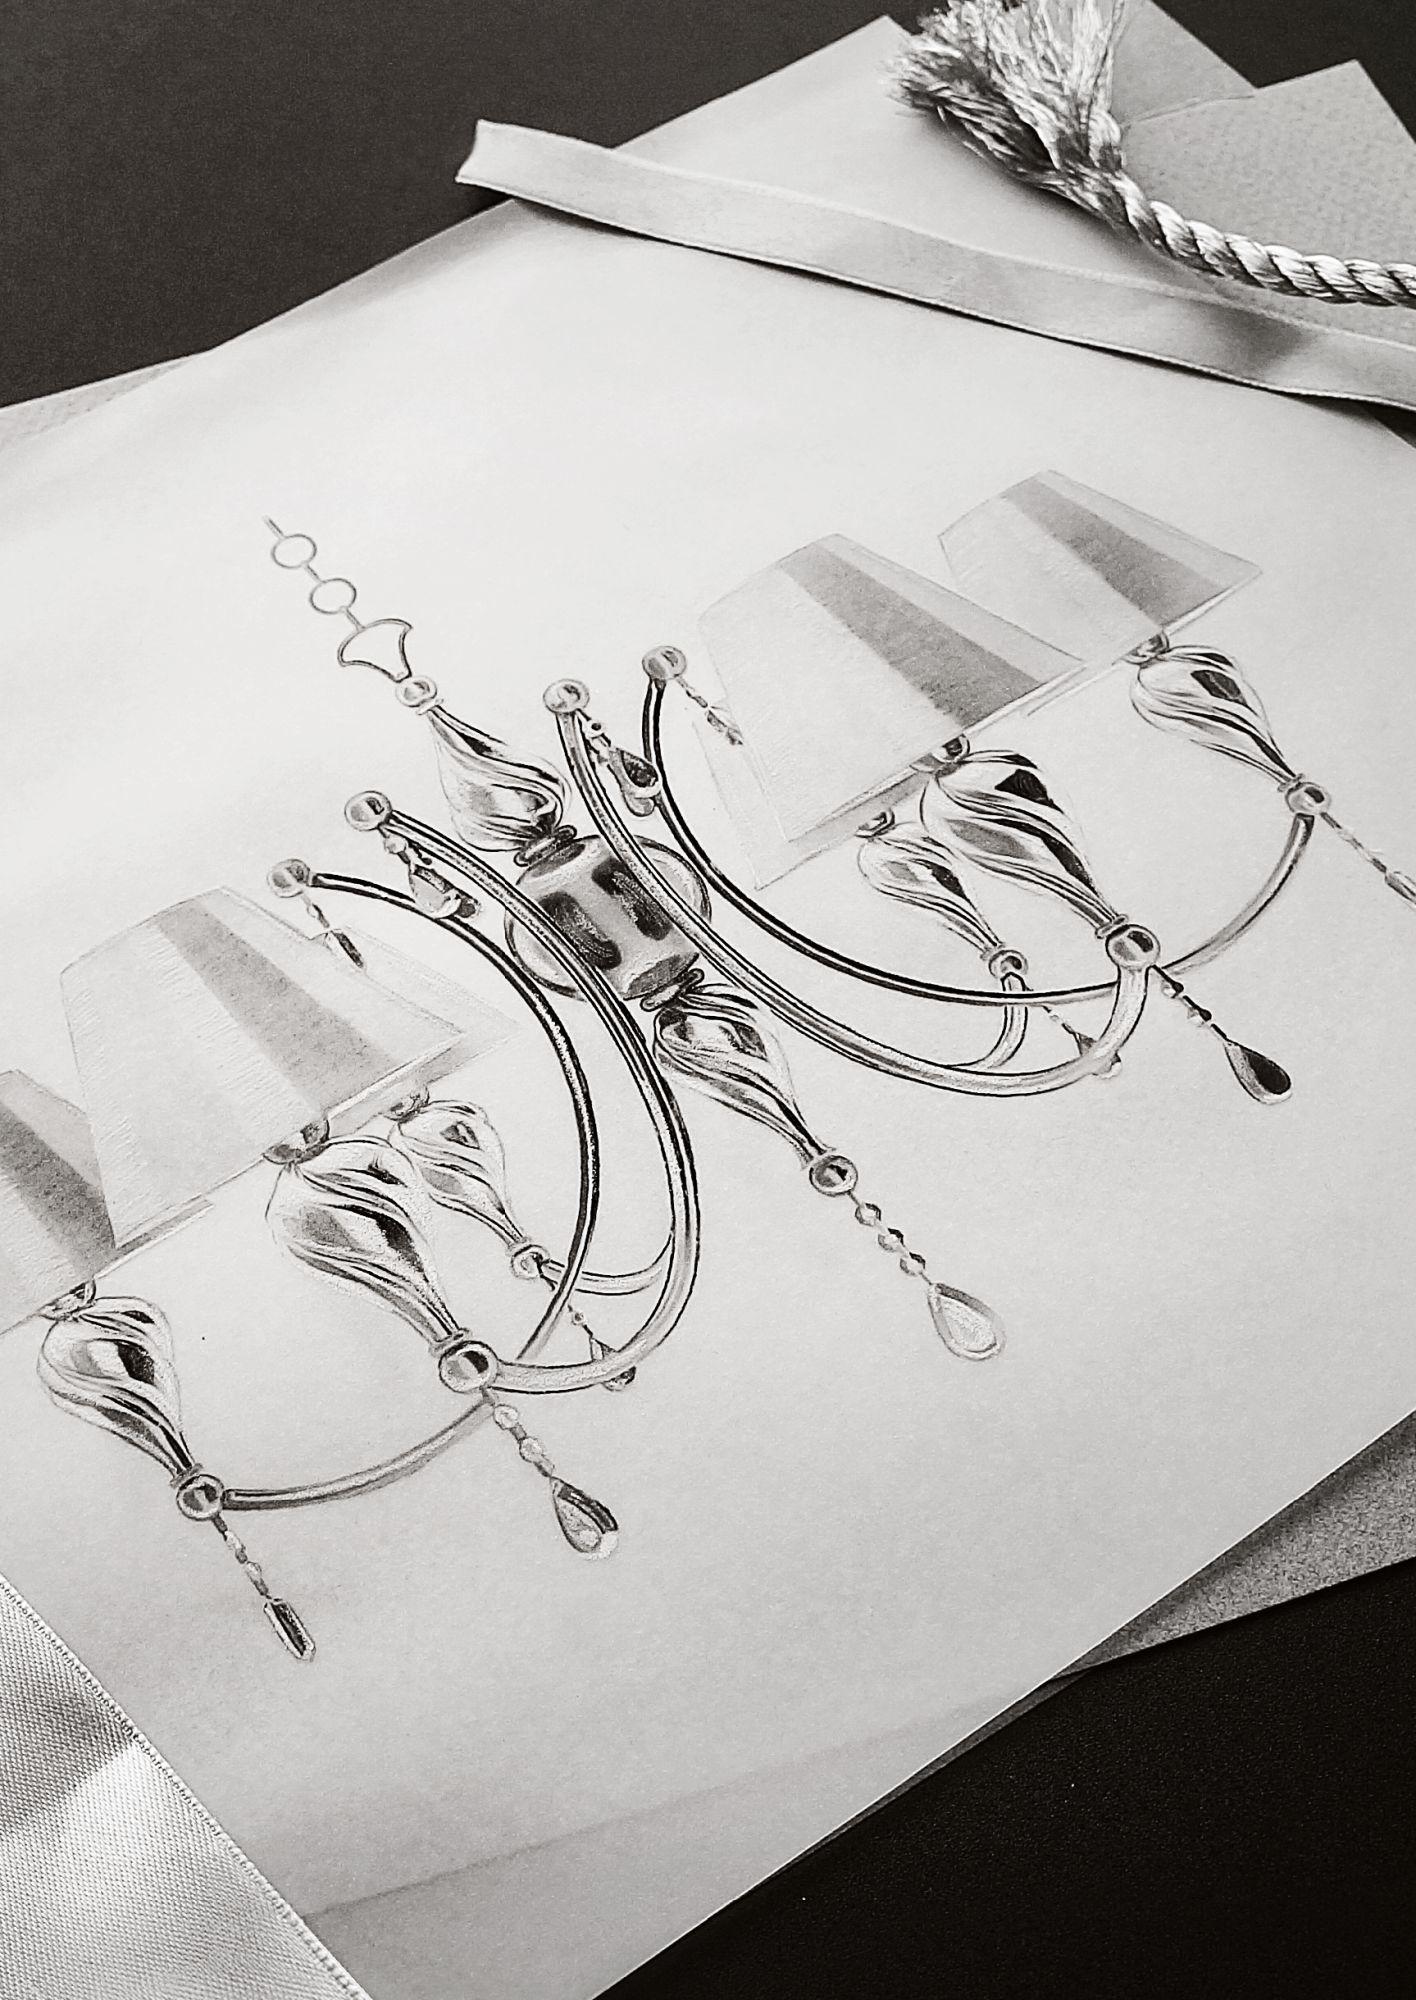 Подвесная люстра Maytoni Murano RC855-PL-08-R (arm855-08-r), 8xE14x40W, бронза, коньячный, бежевый, металл со стеклом, текстиль, хрусталь - фото 4